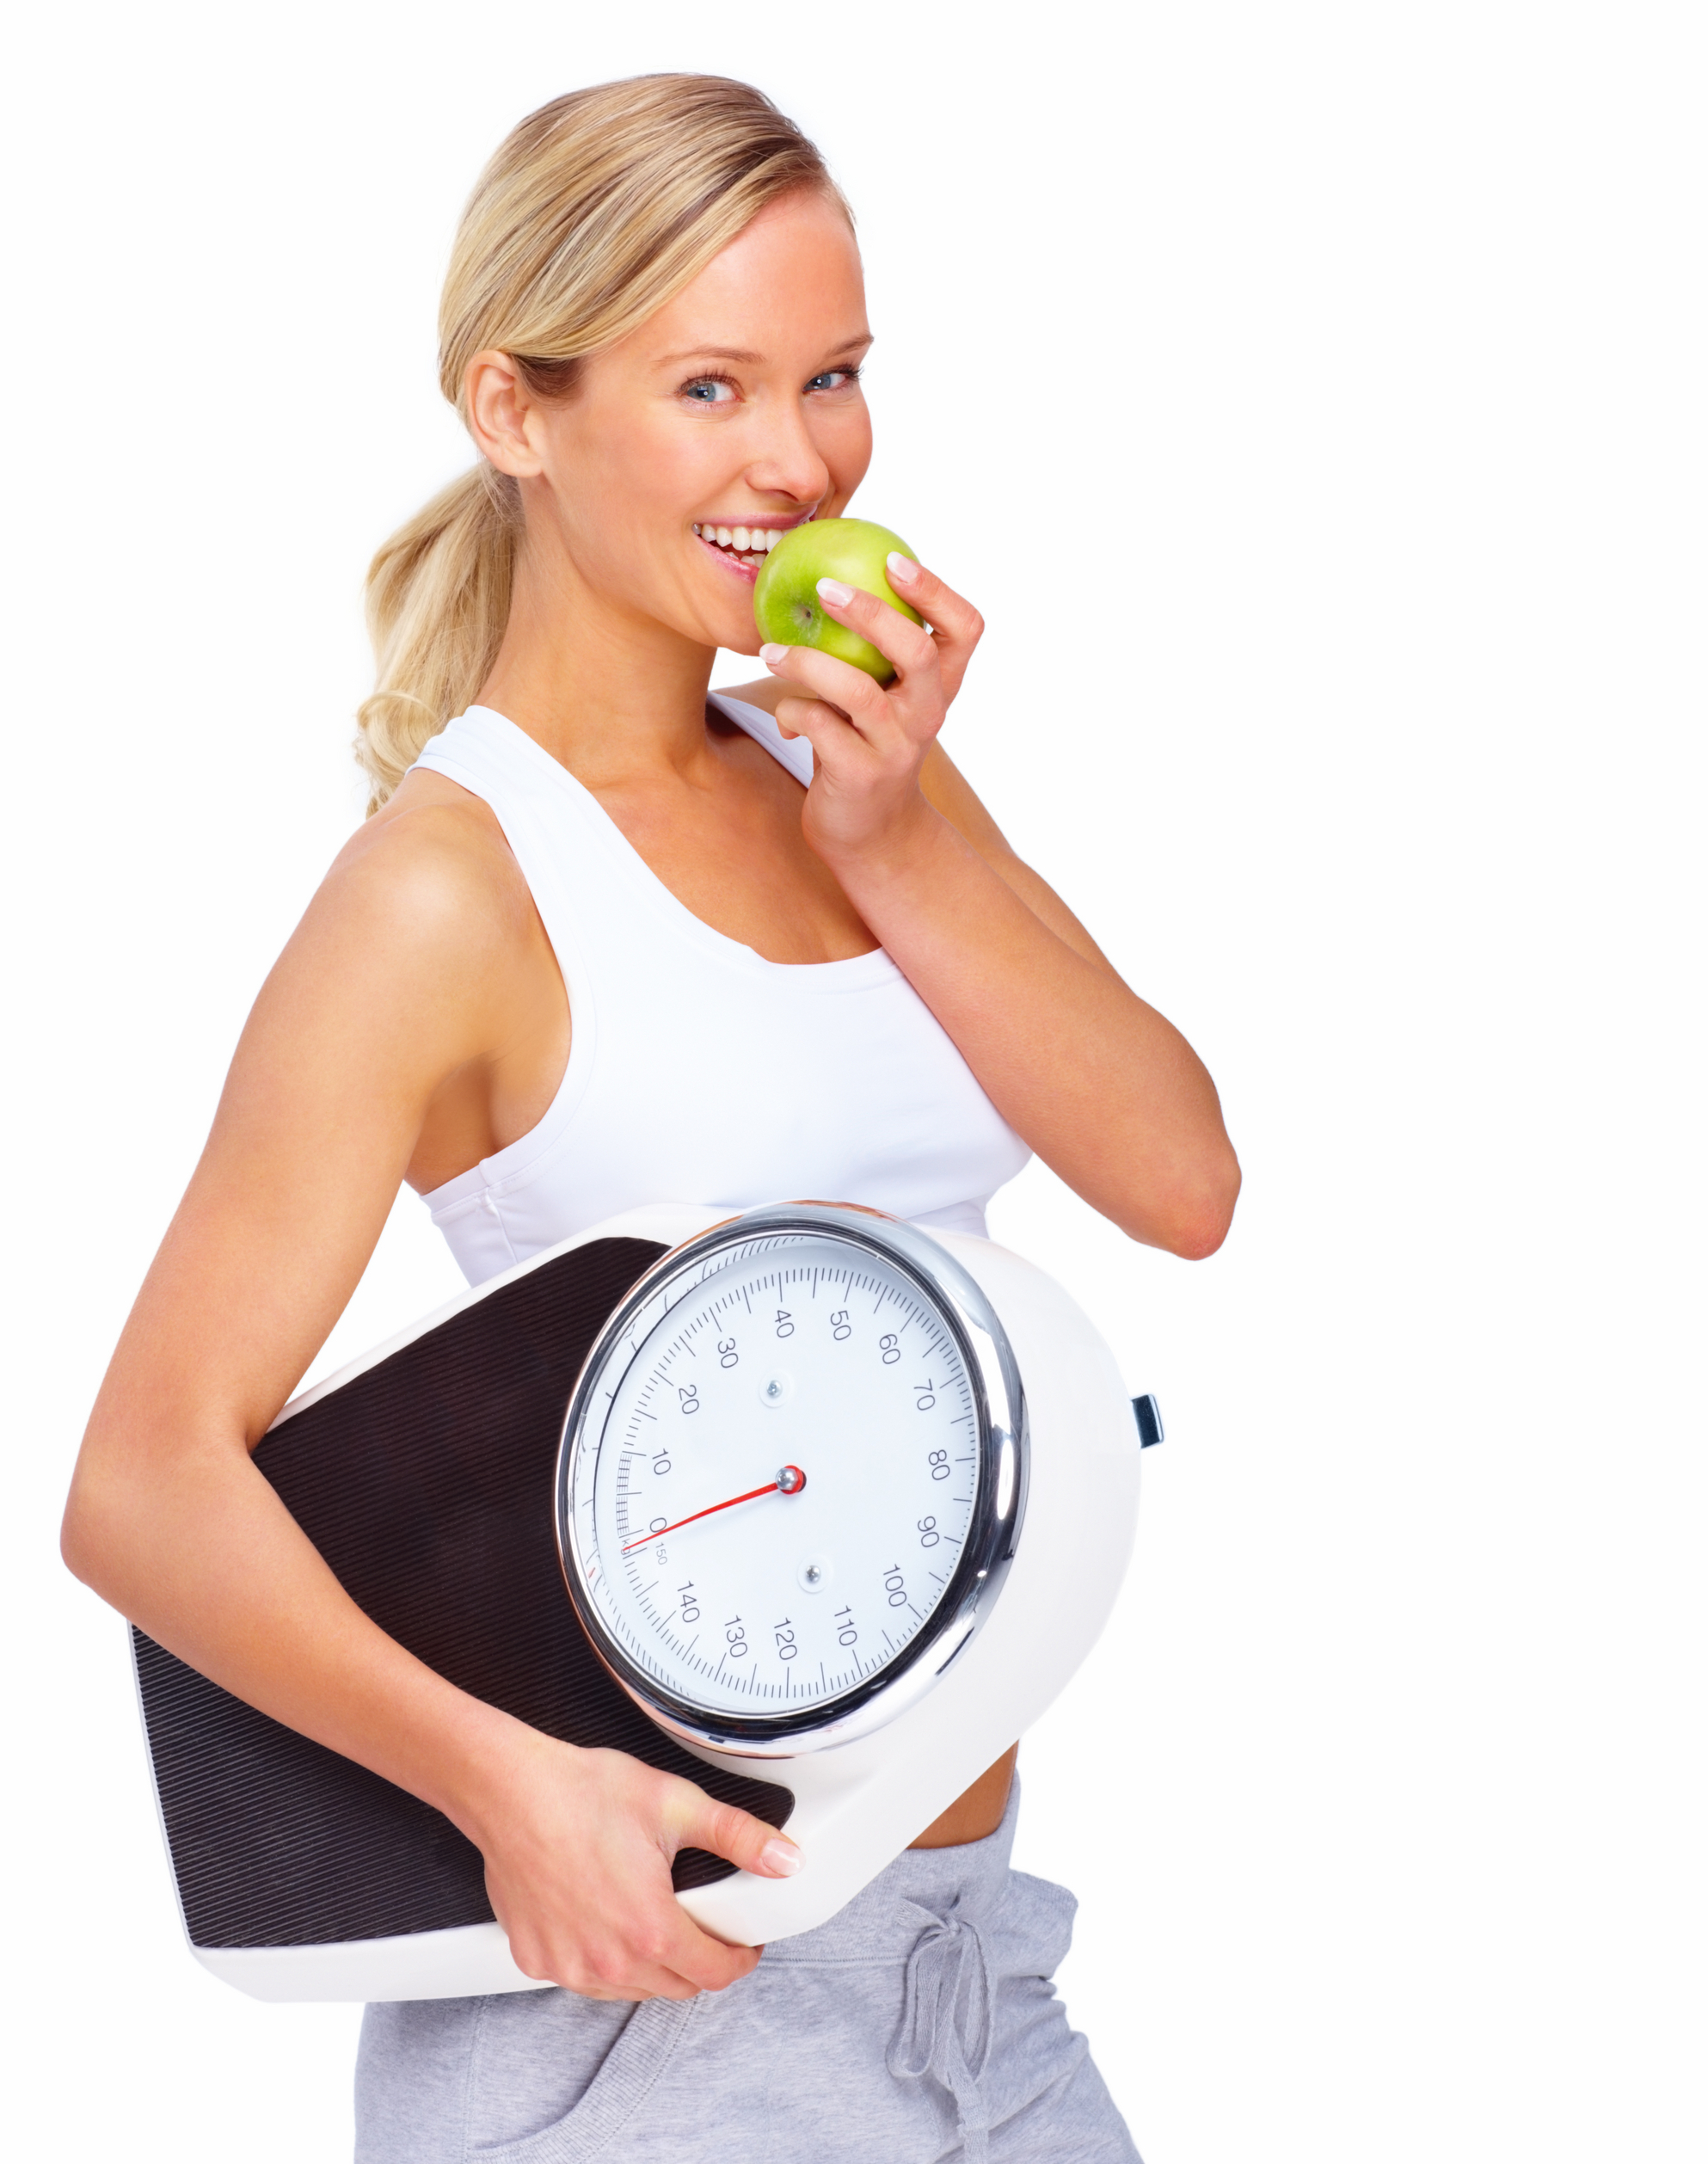 лишний вес и знакомства